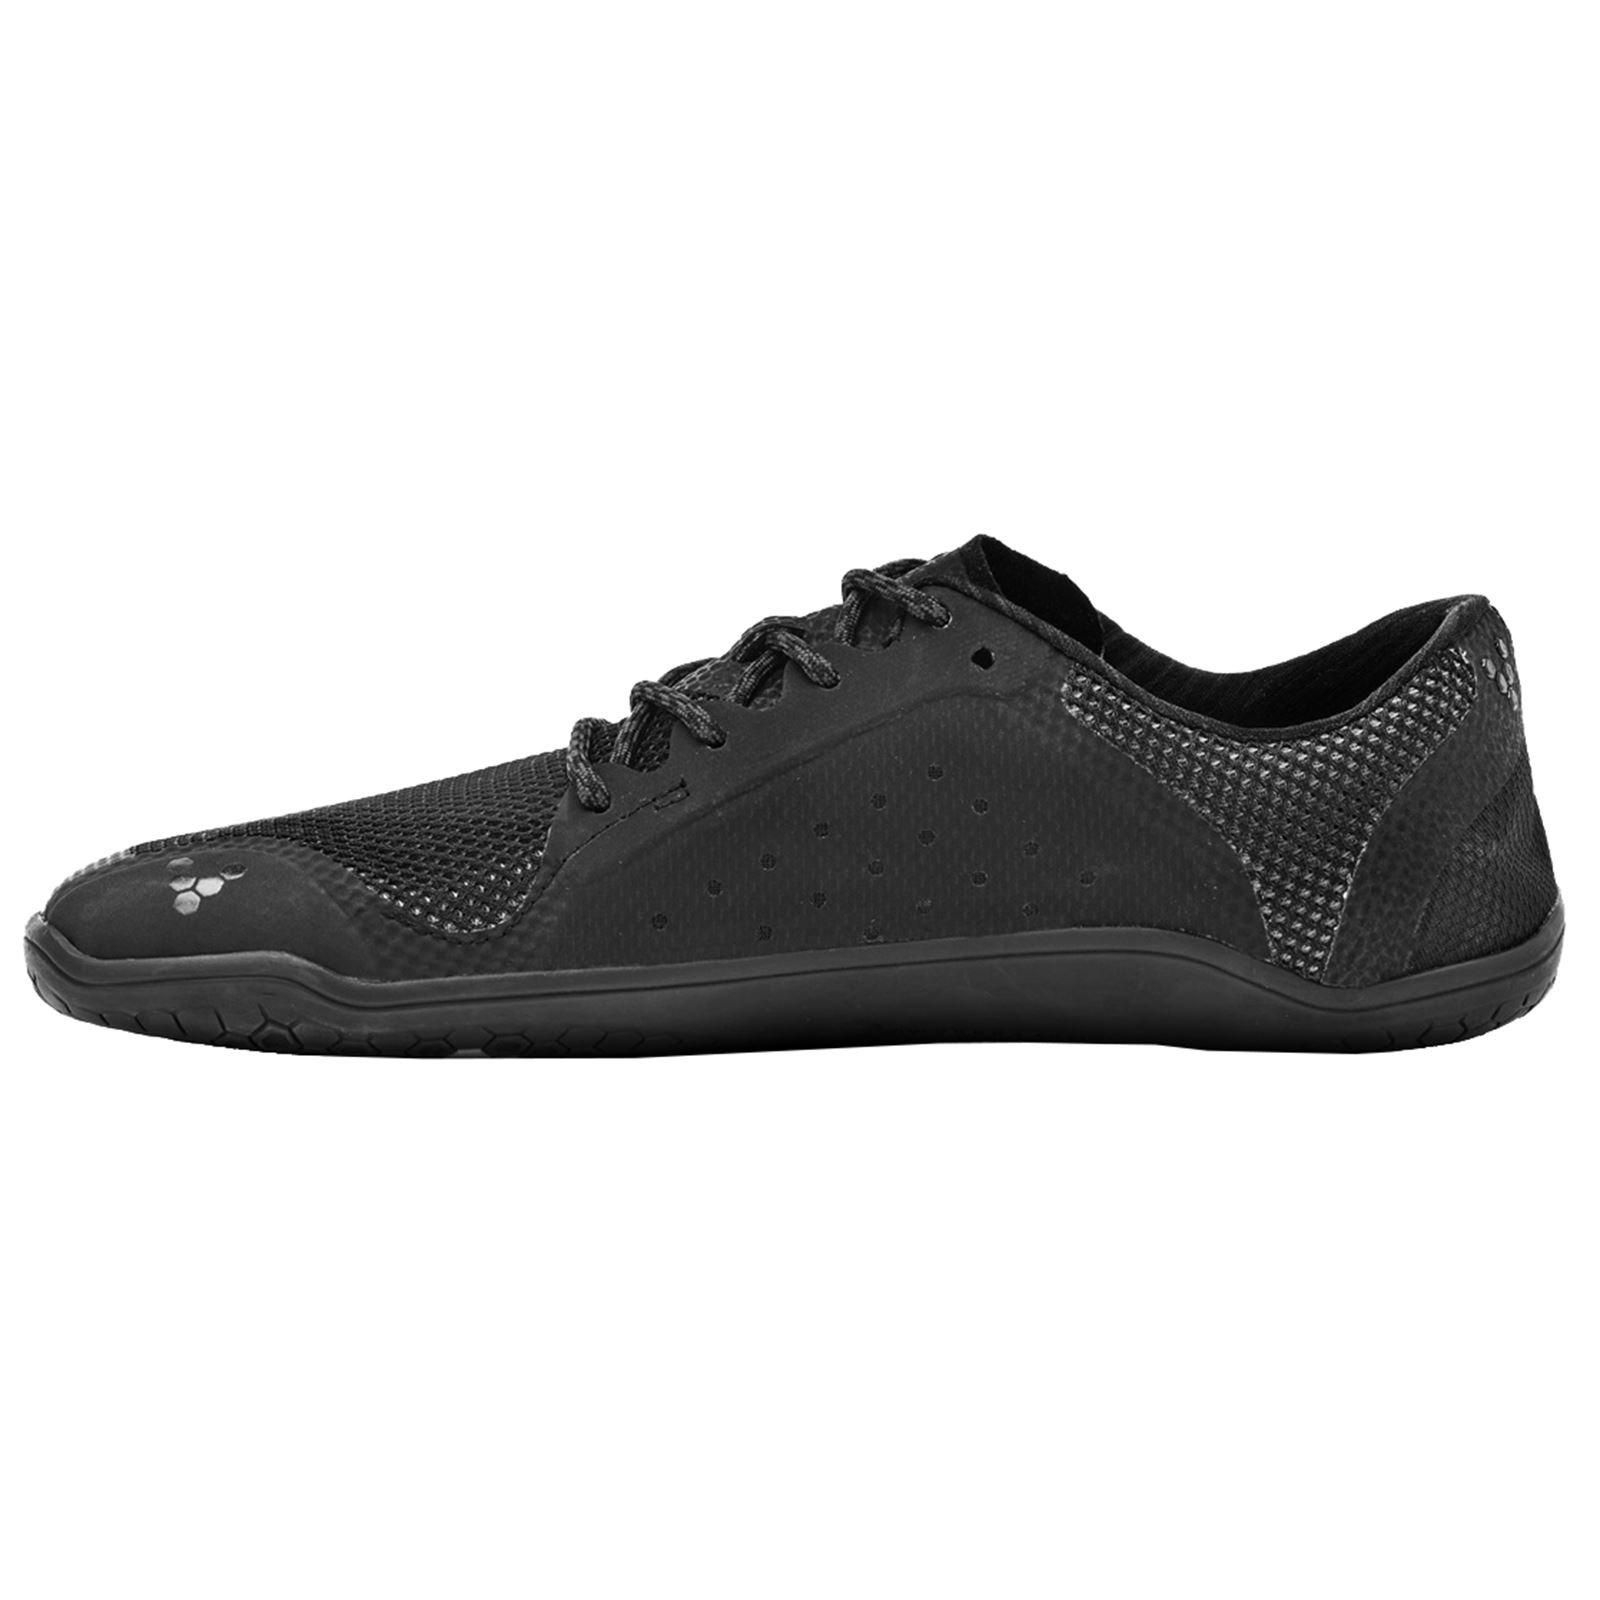 Vivobarefoot Women's Primus Lite Running Trainer Shoe, All Black, 39 D EU (8 US) by Vivobarefoot (Image #4)